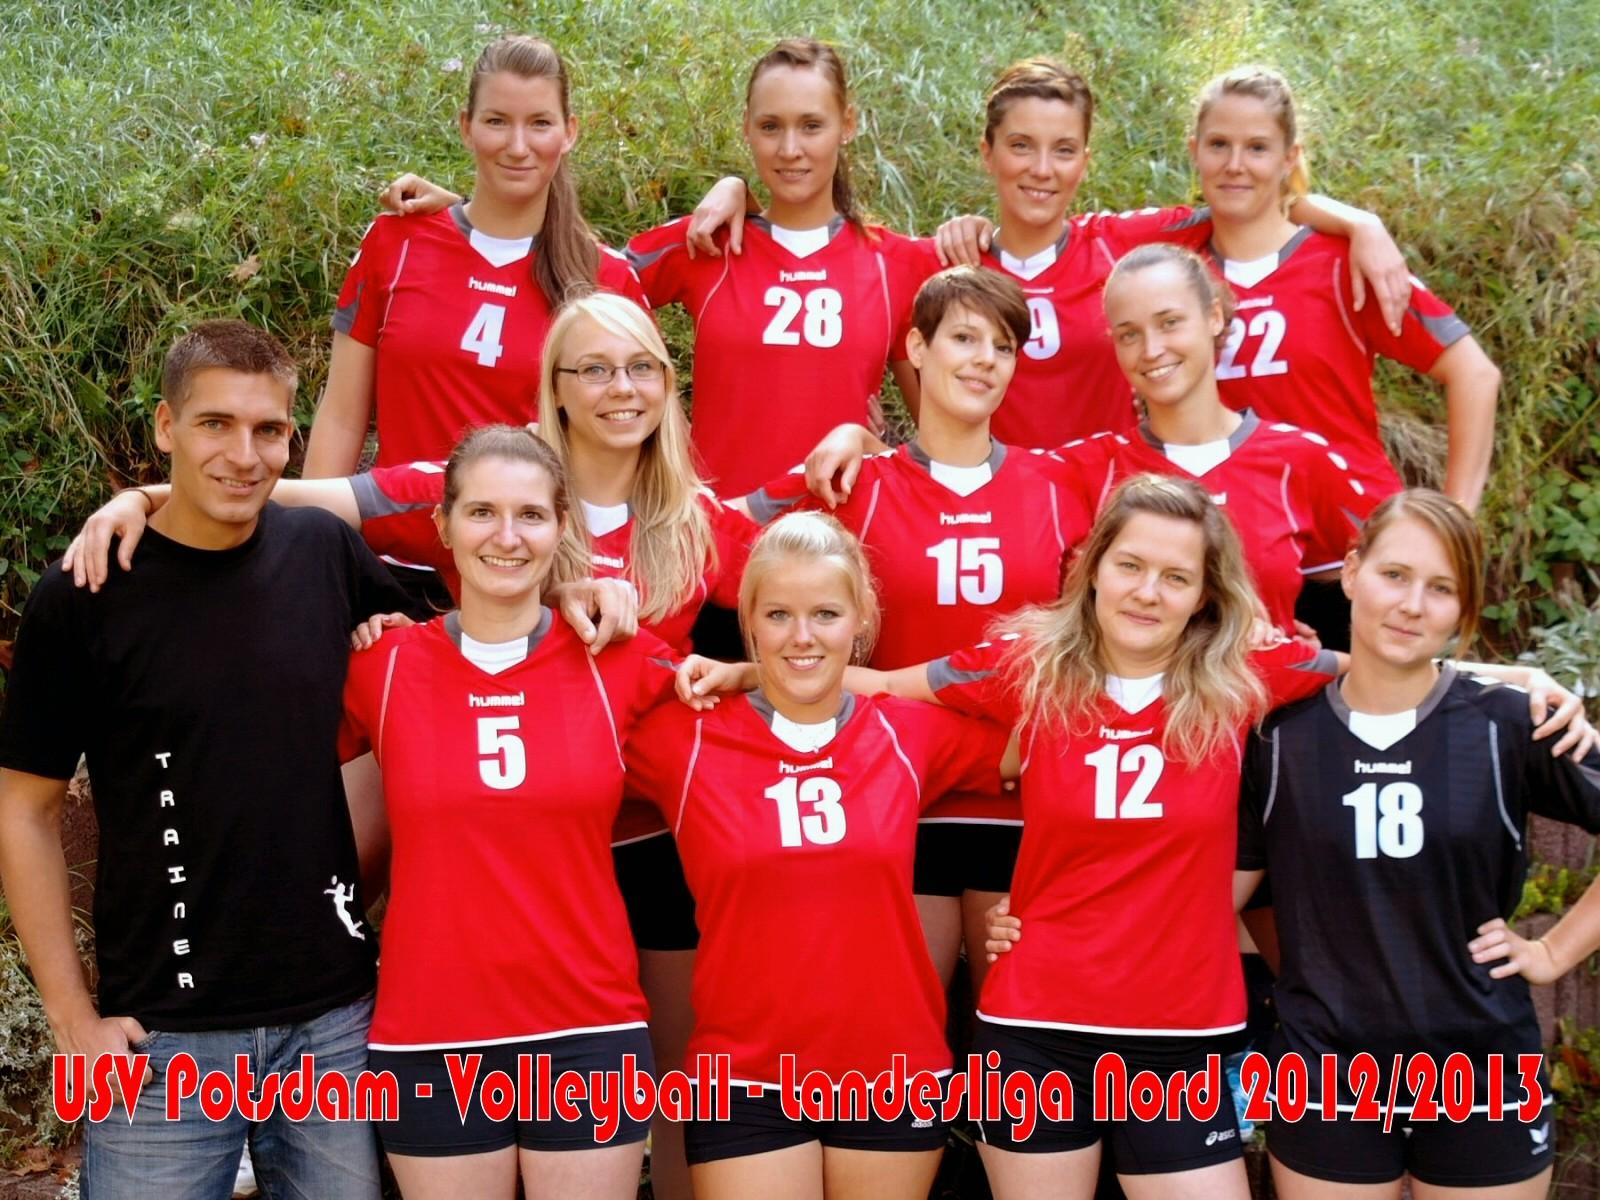 Landesliga Nord 2012/2013